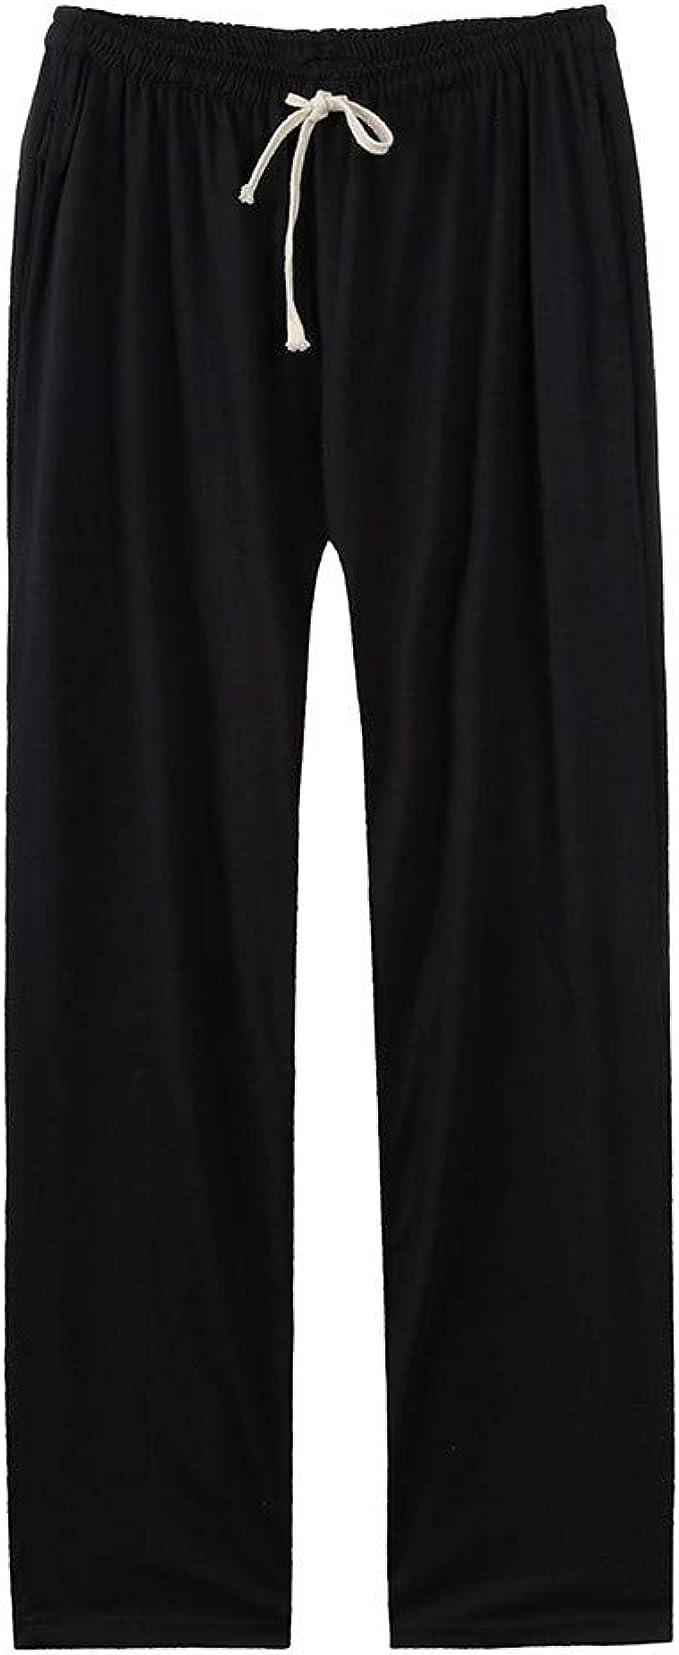 VPASS Pantalones para Hombre,Pantalones Recto Casuales Moda ...